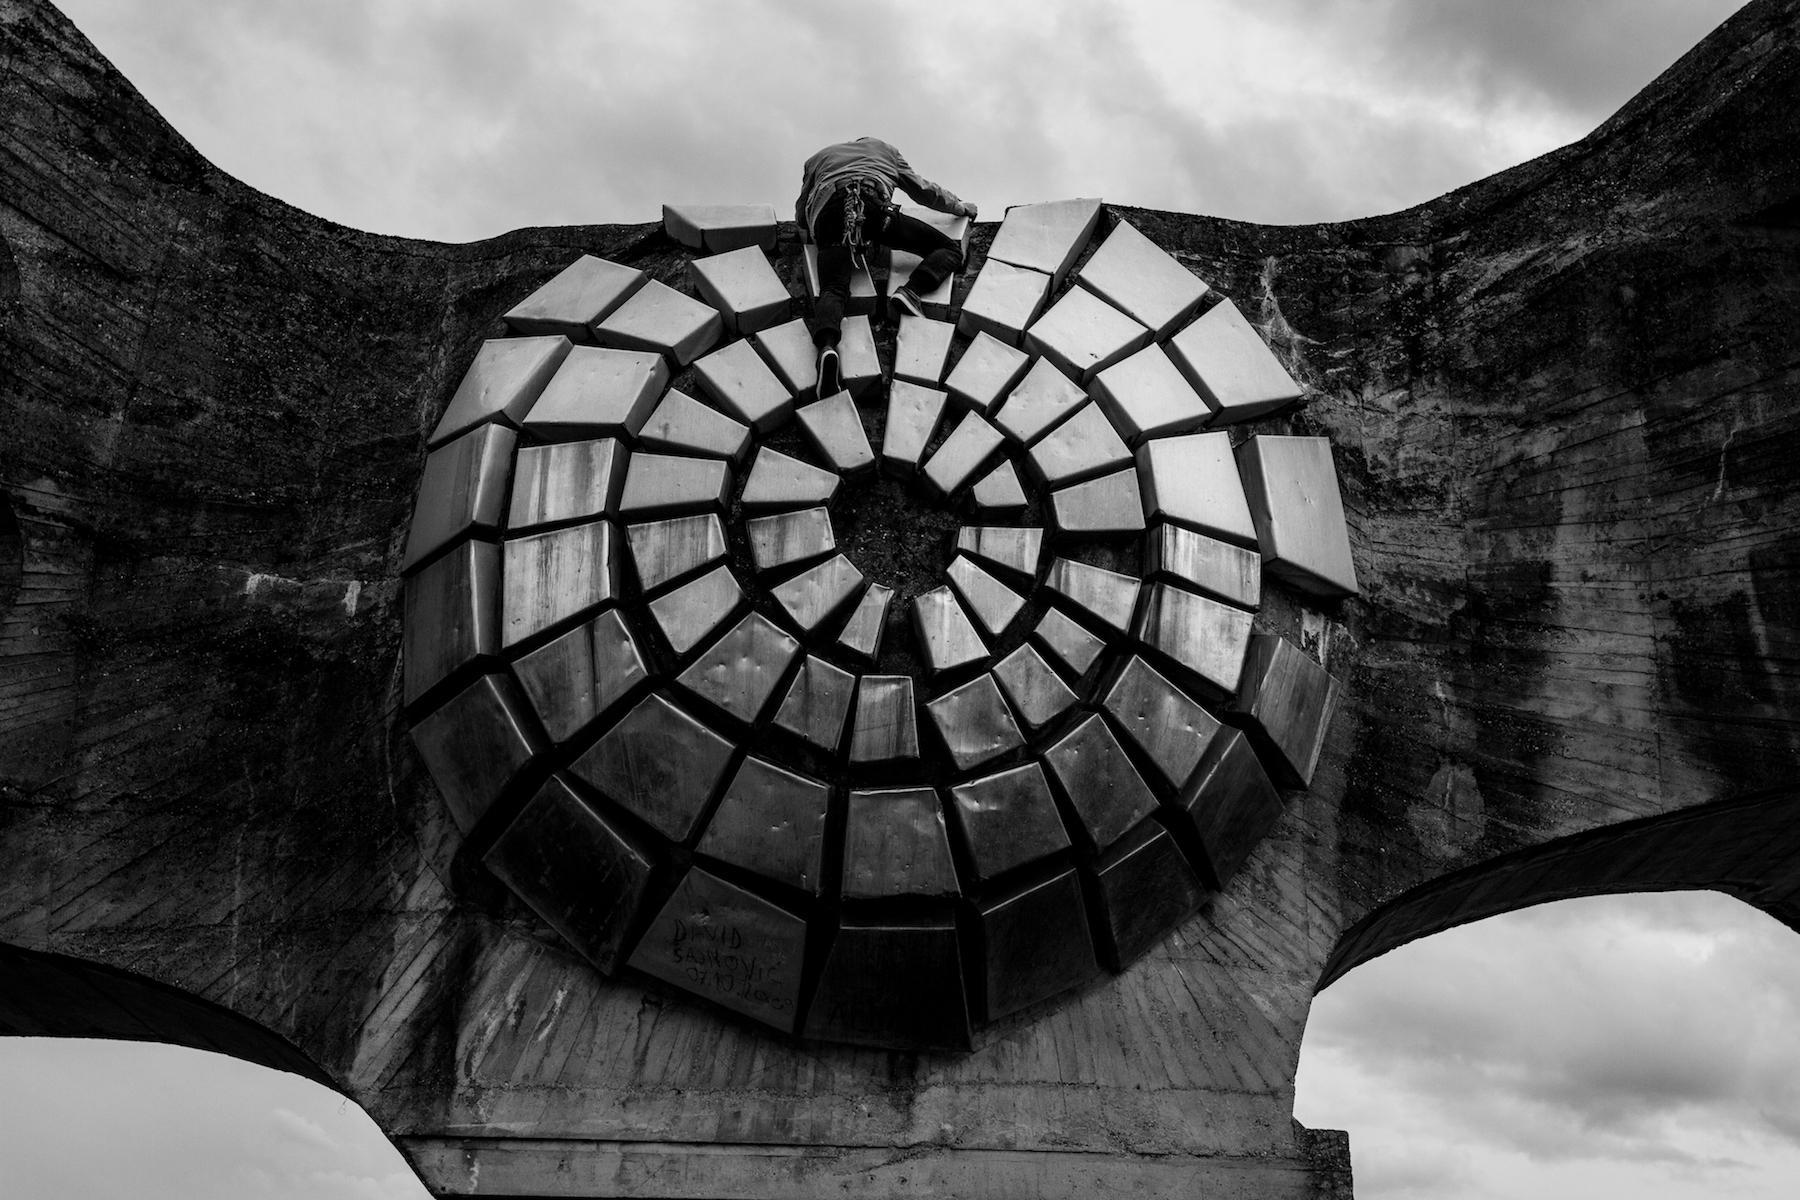 luke-paige-skate-photography-02